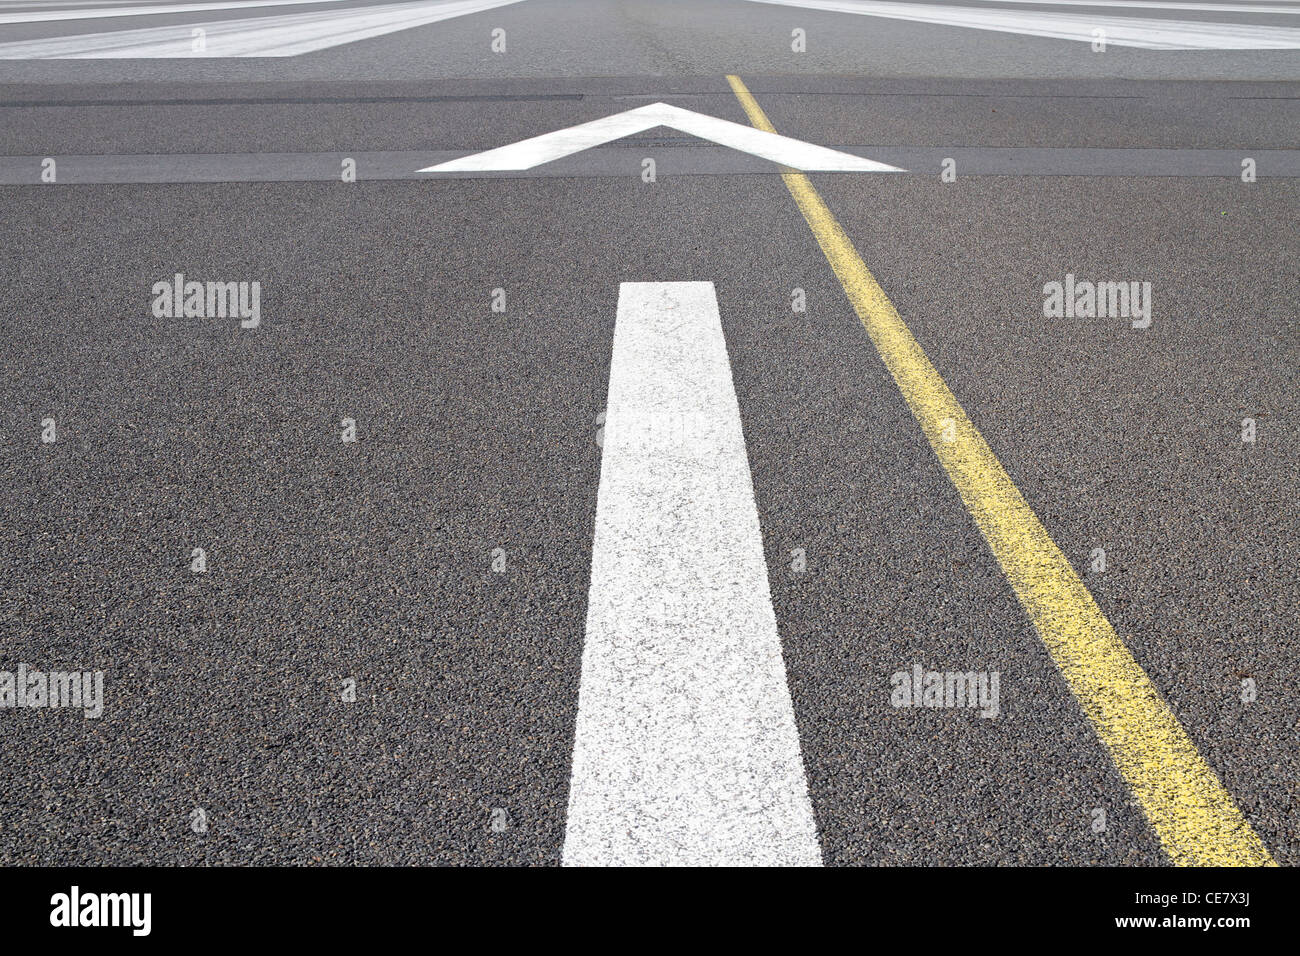 Directrices sobre la pista de aterrizaje Imagen De Stock